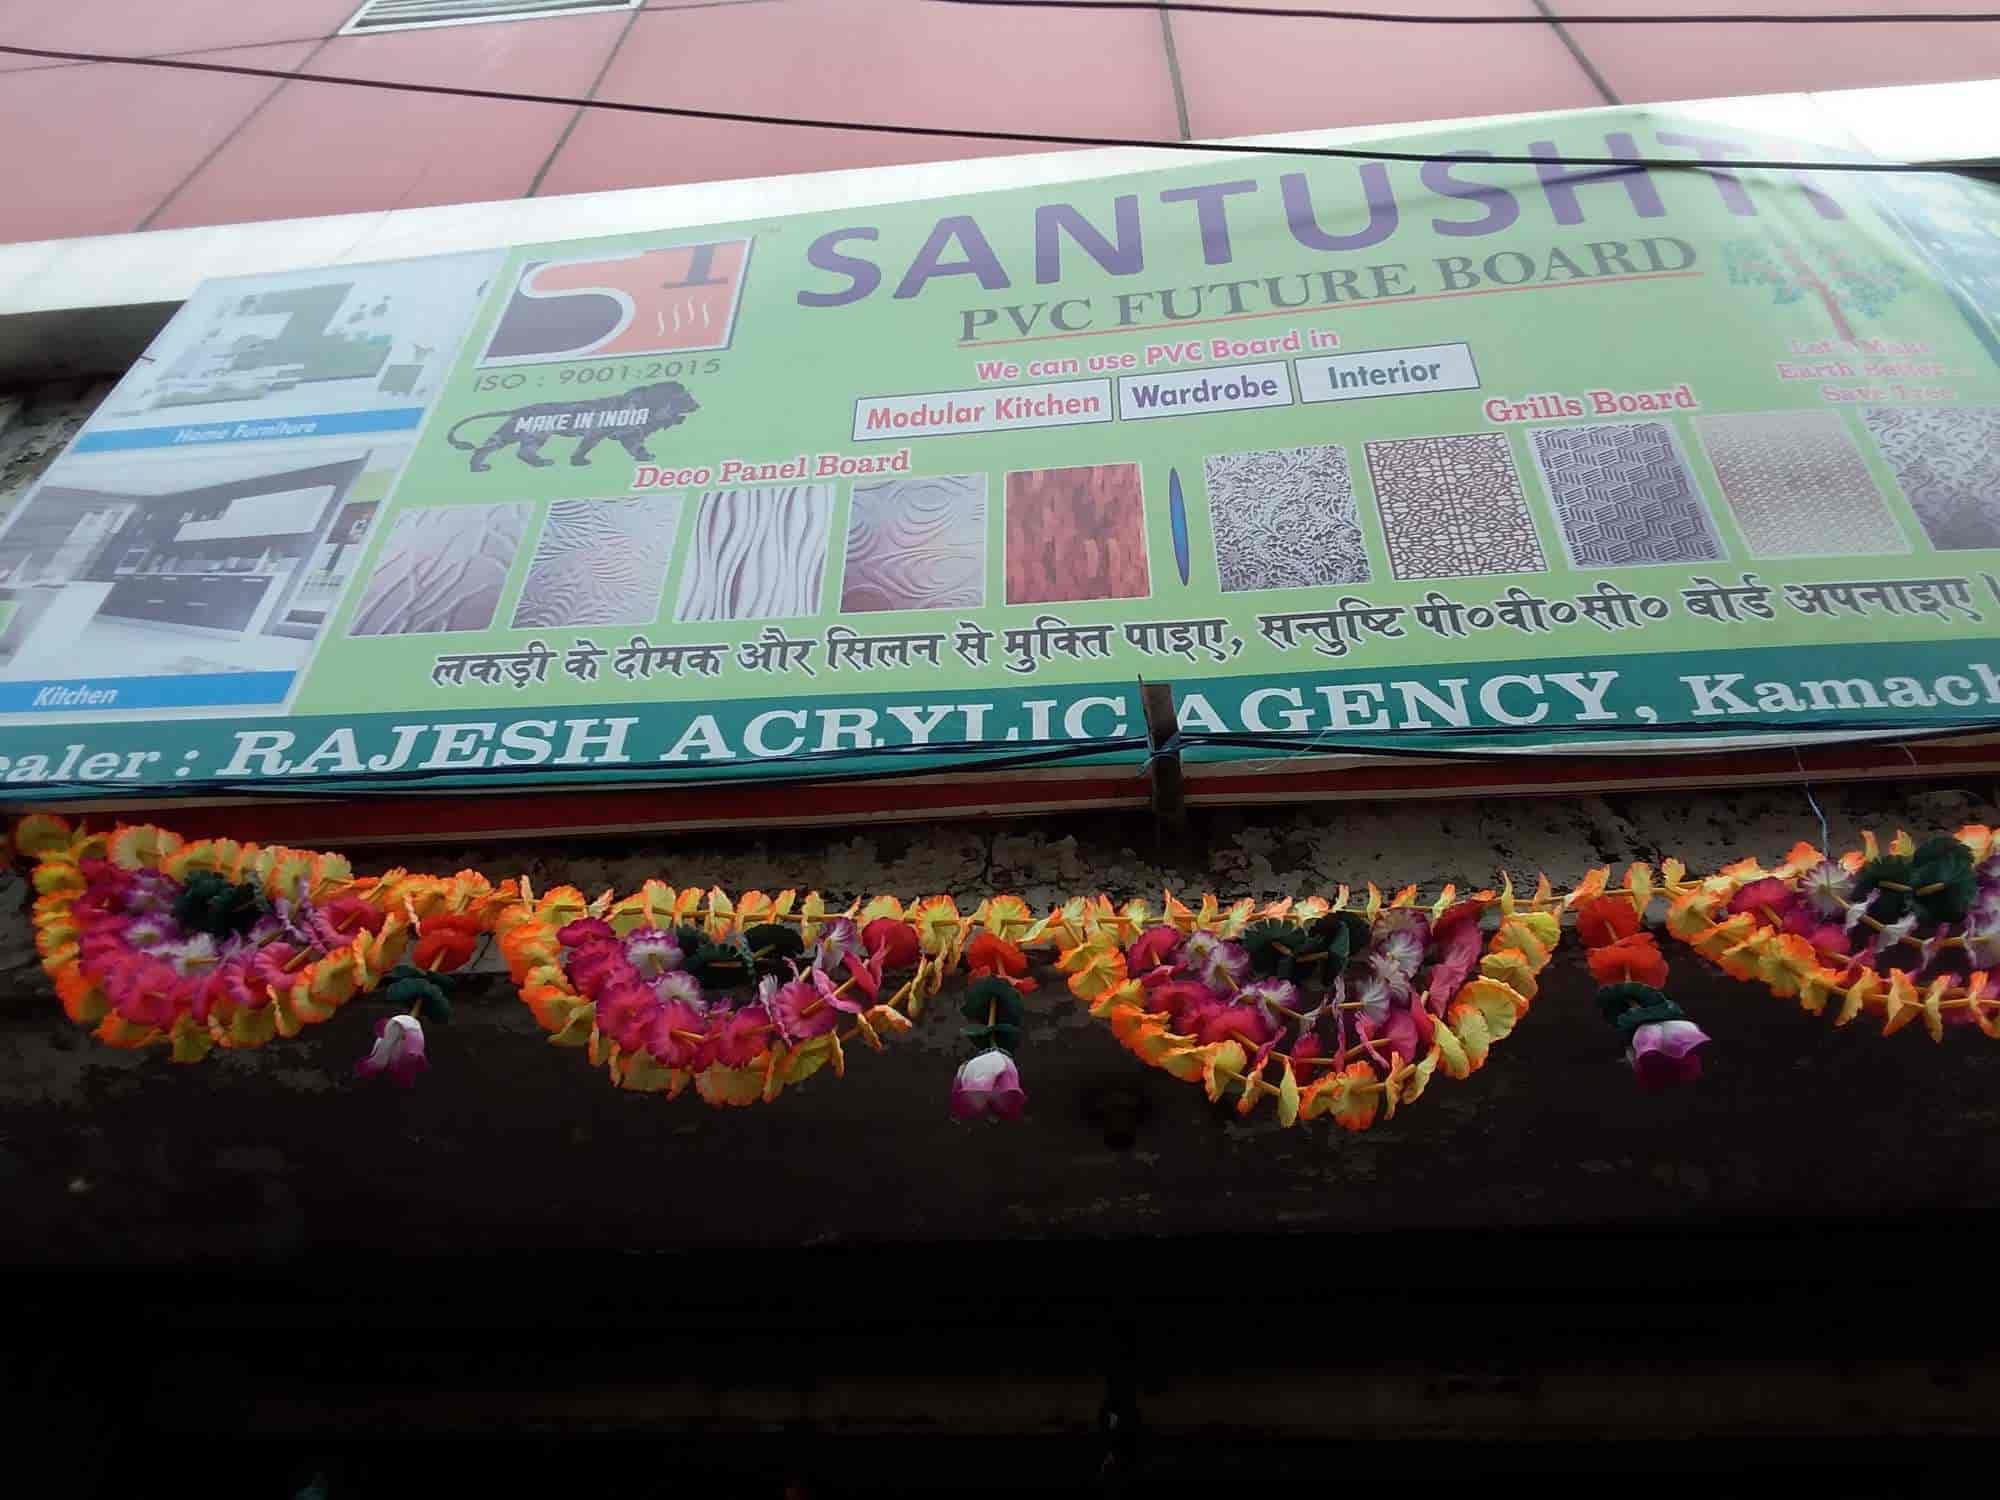 Rajesh Acrylic Agency Photos, Kamachha, Varanasi- Pictures & Images ...